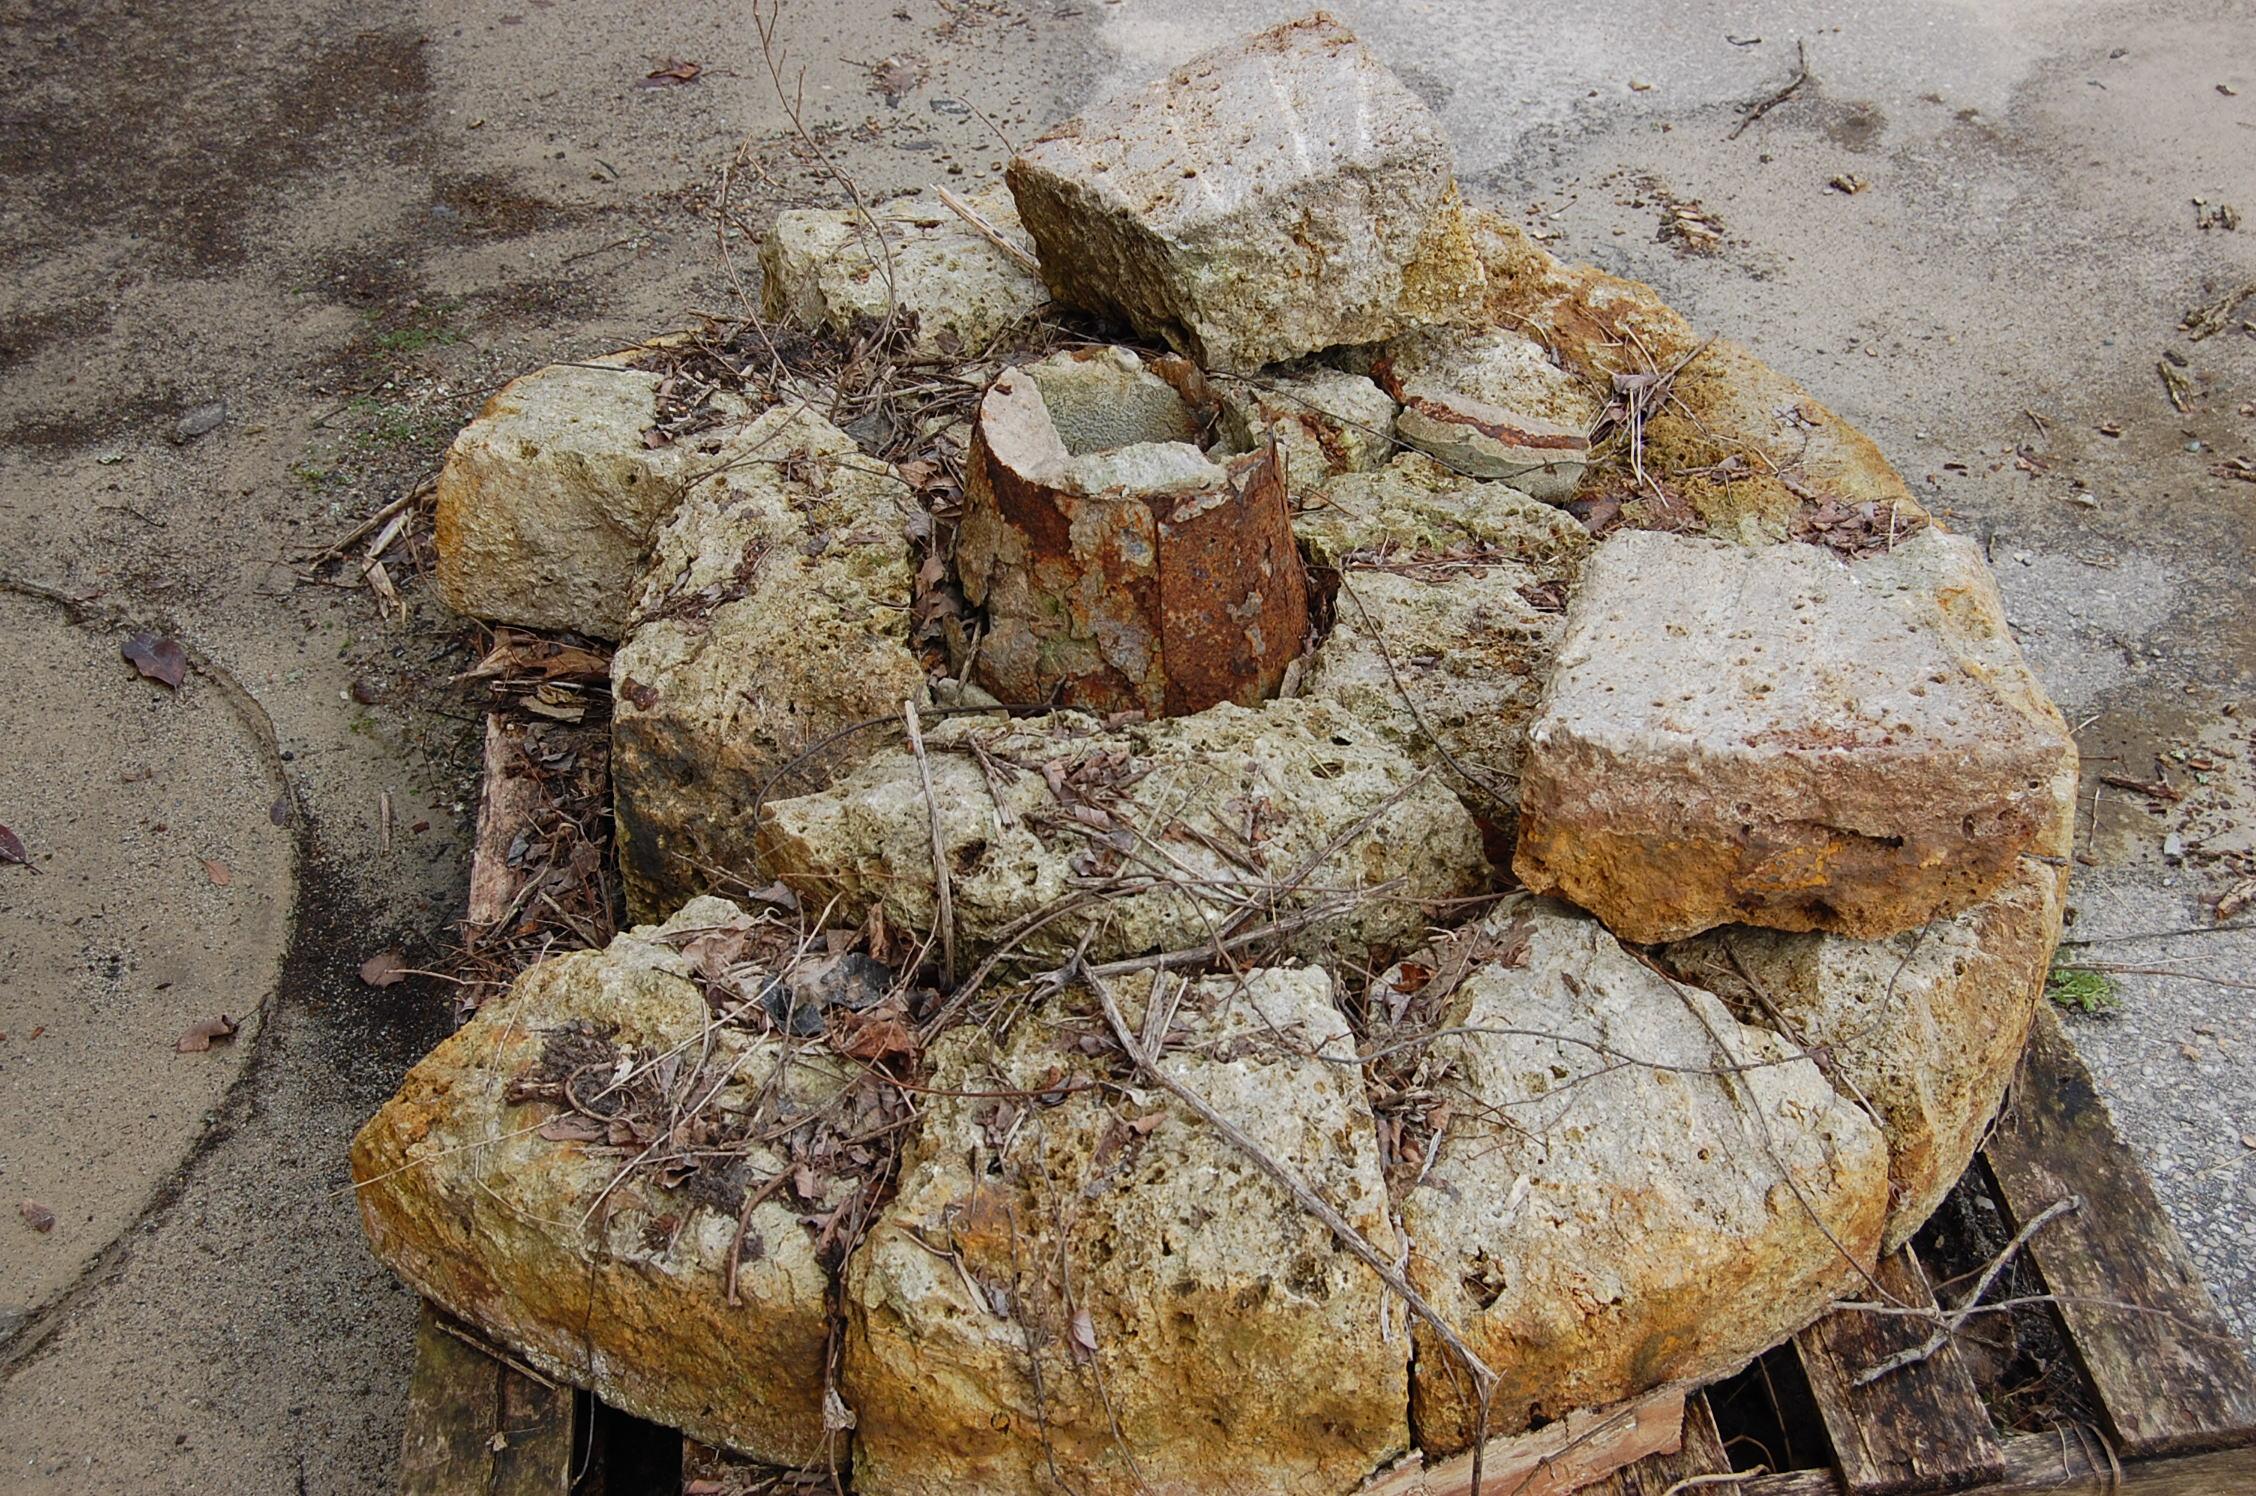 The original Mount Healthy Flour Mill millstone